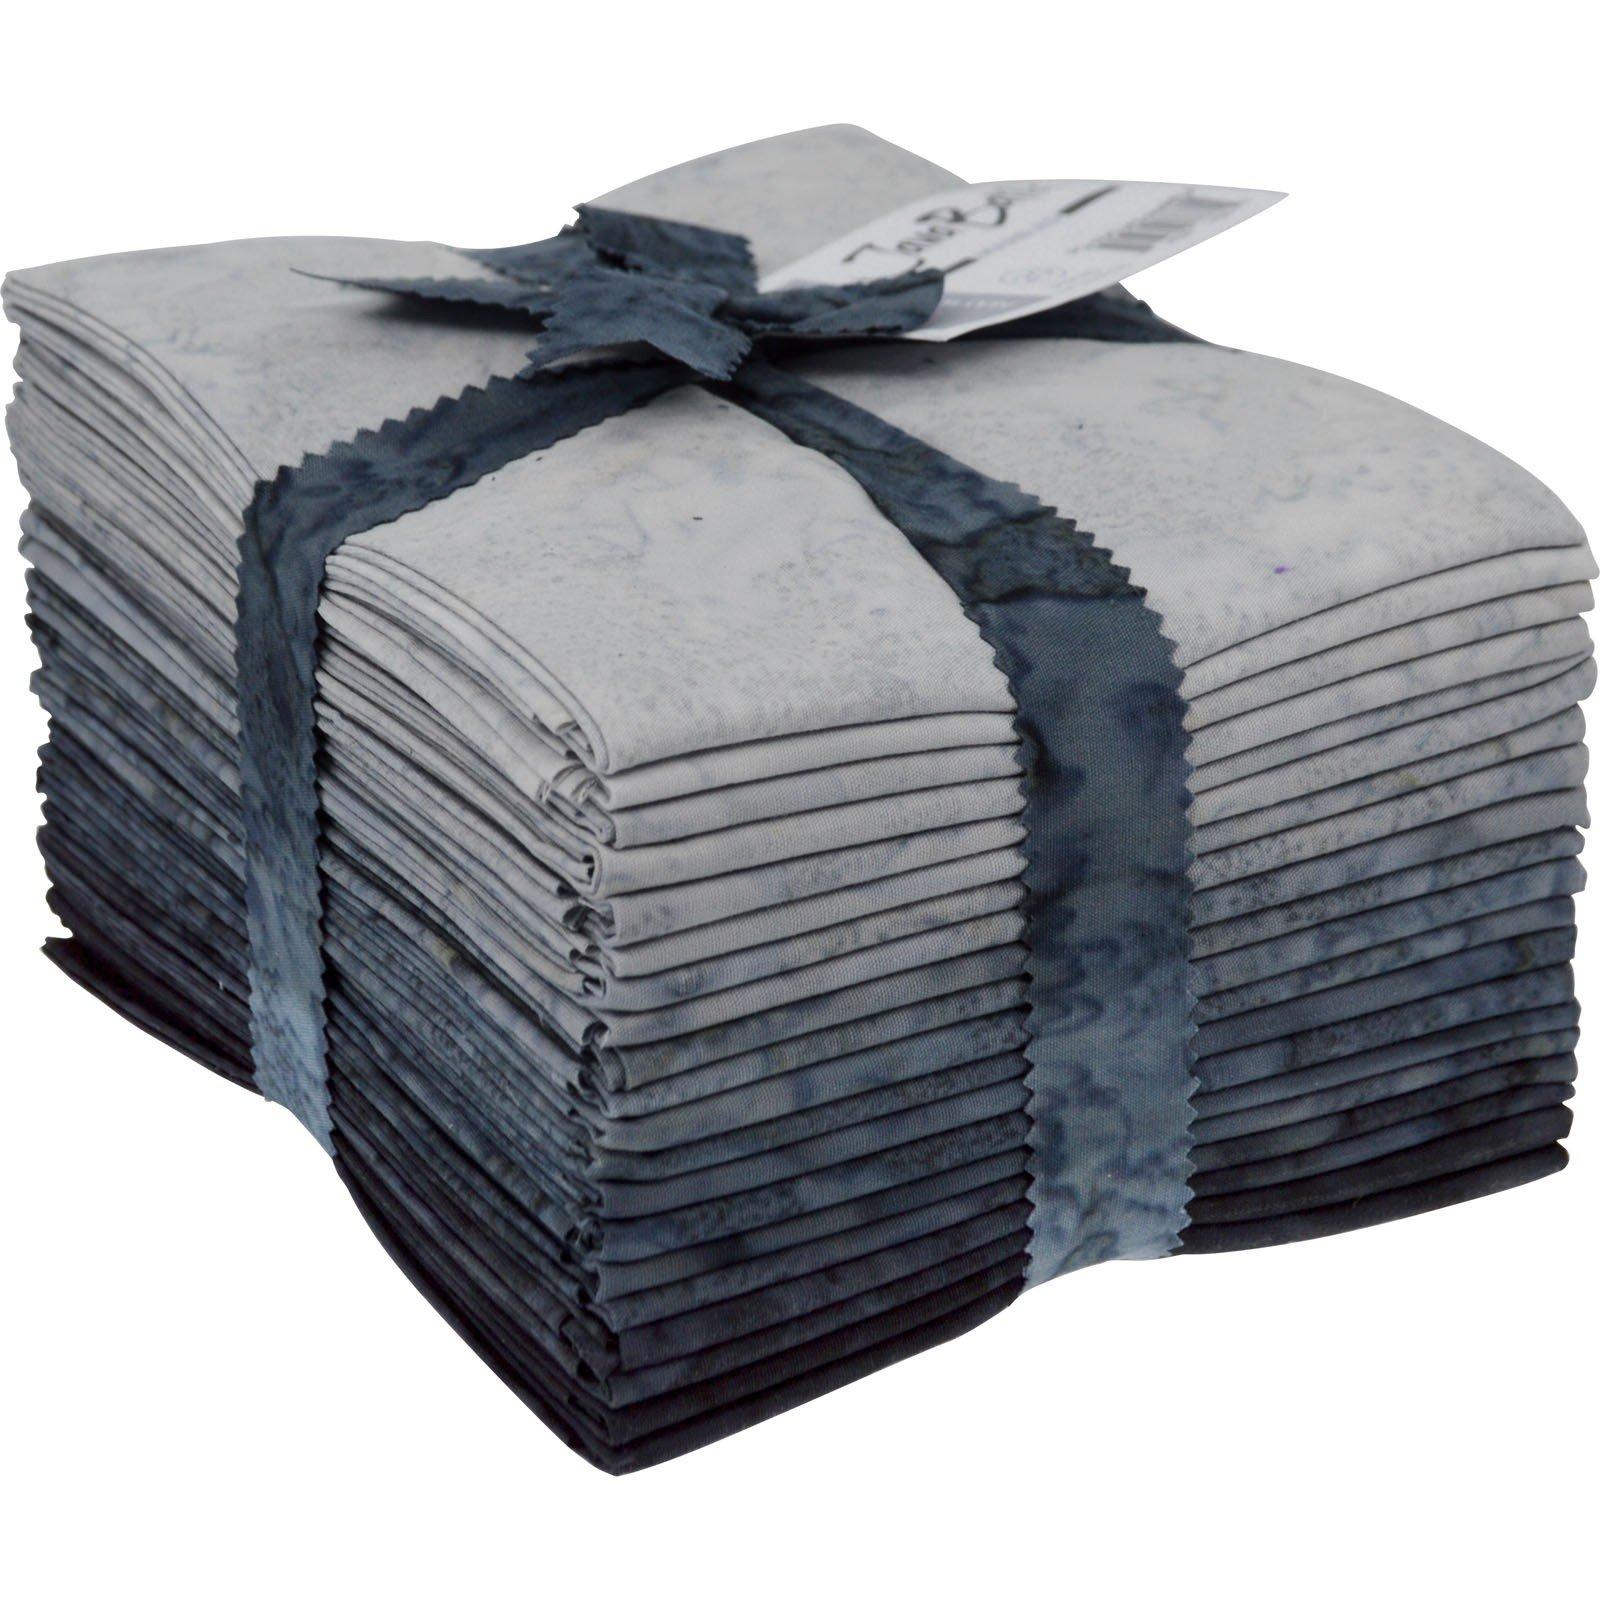 Maywood Java Batiks GREY/BLACK  Marble Bundles Fat Quarters (20)